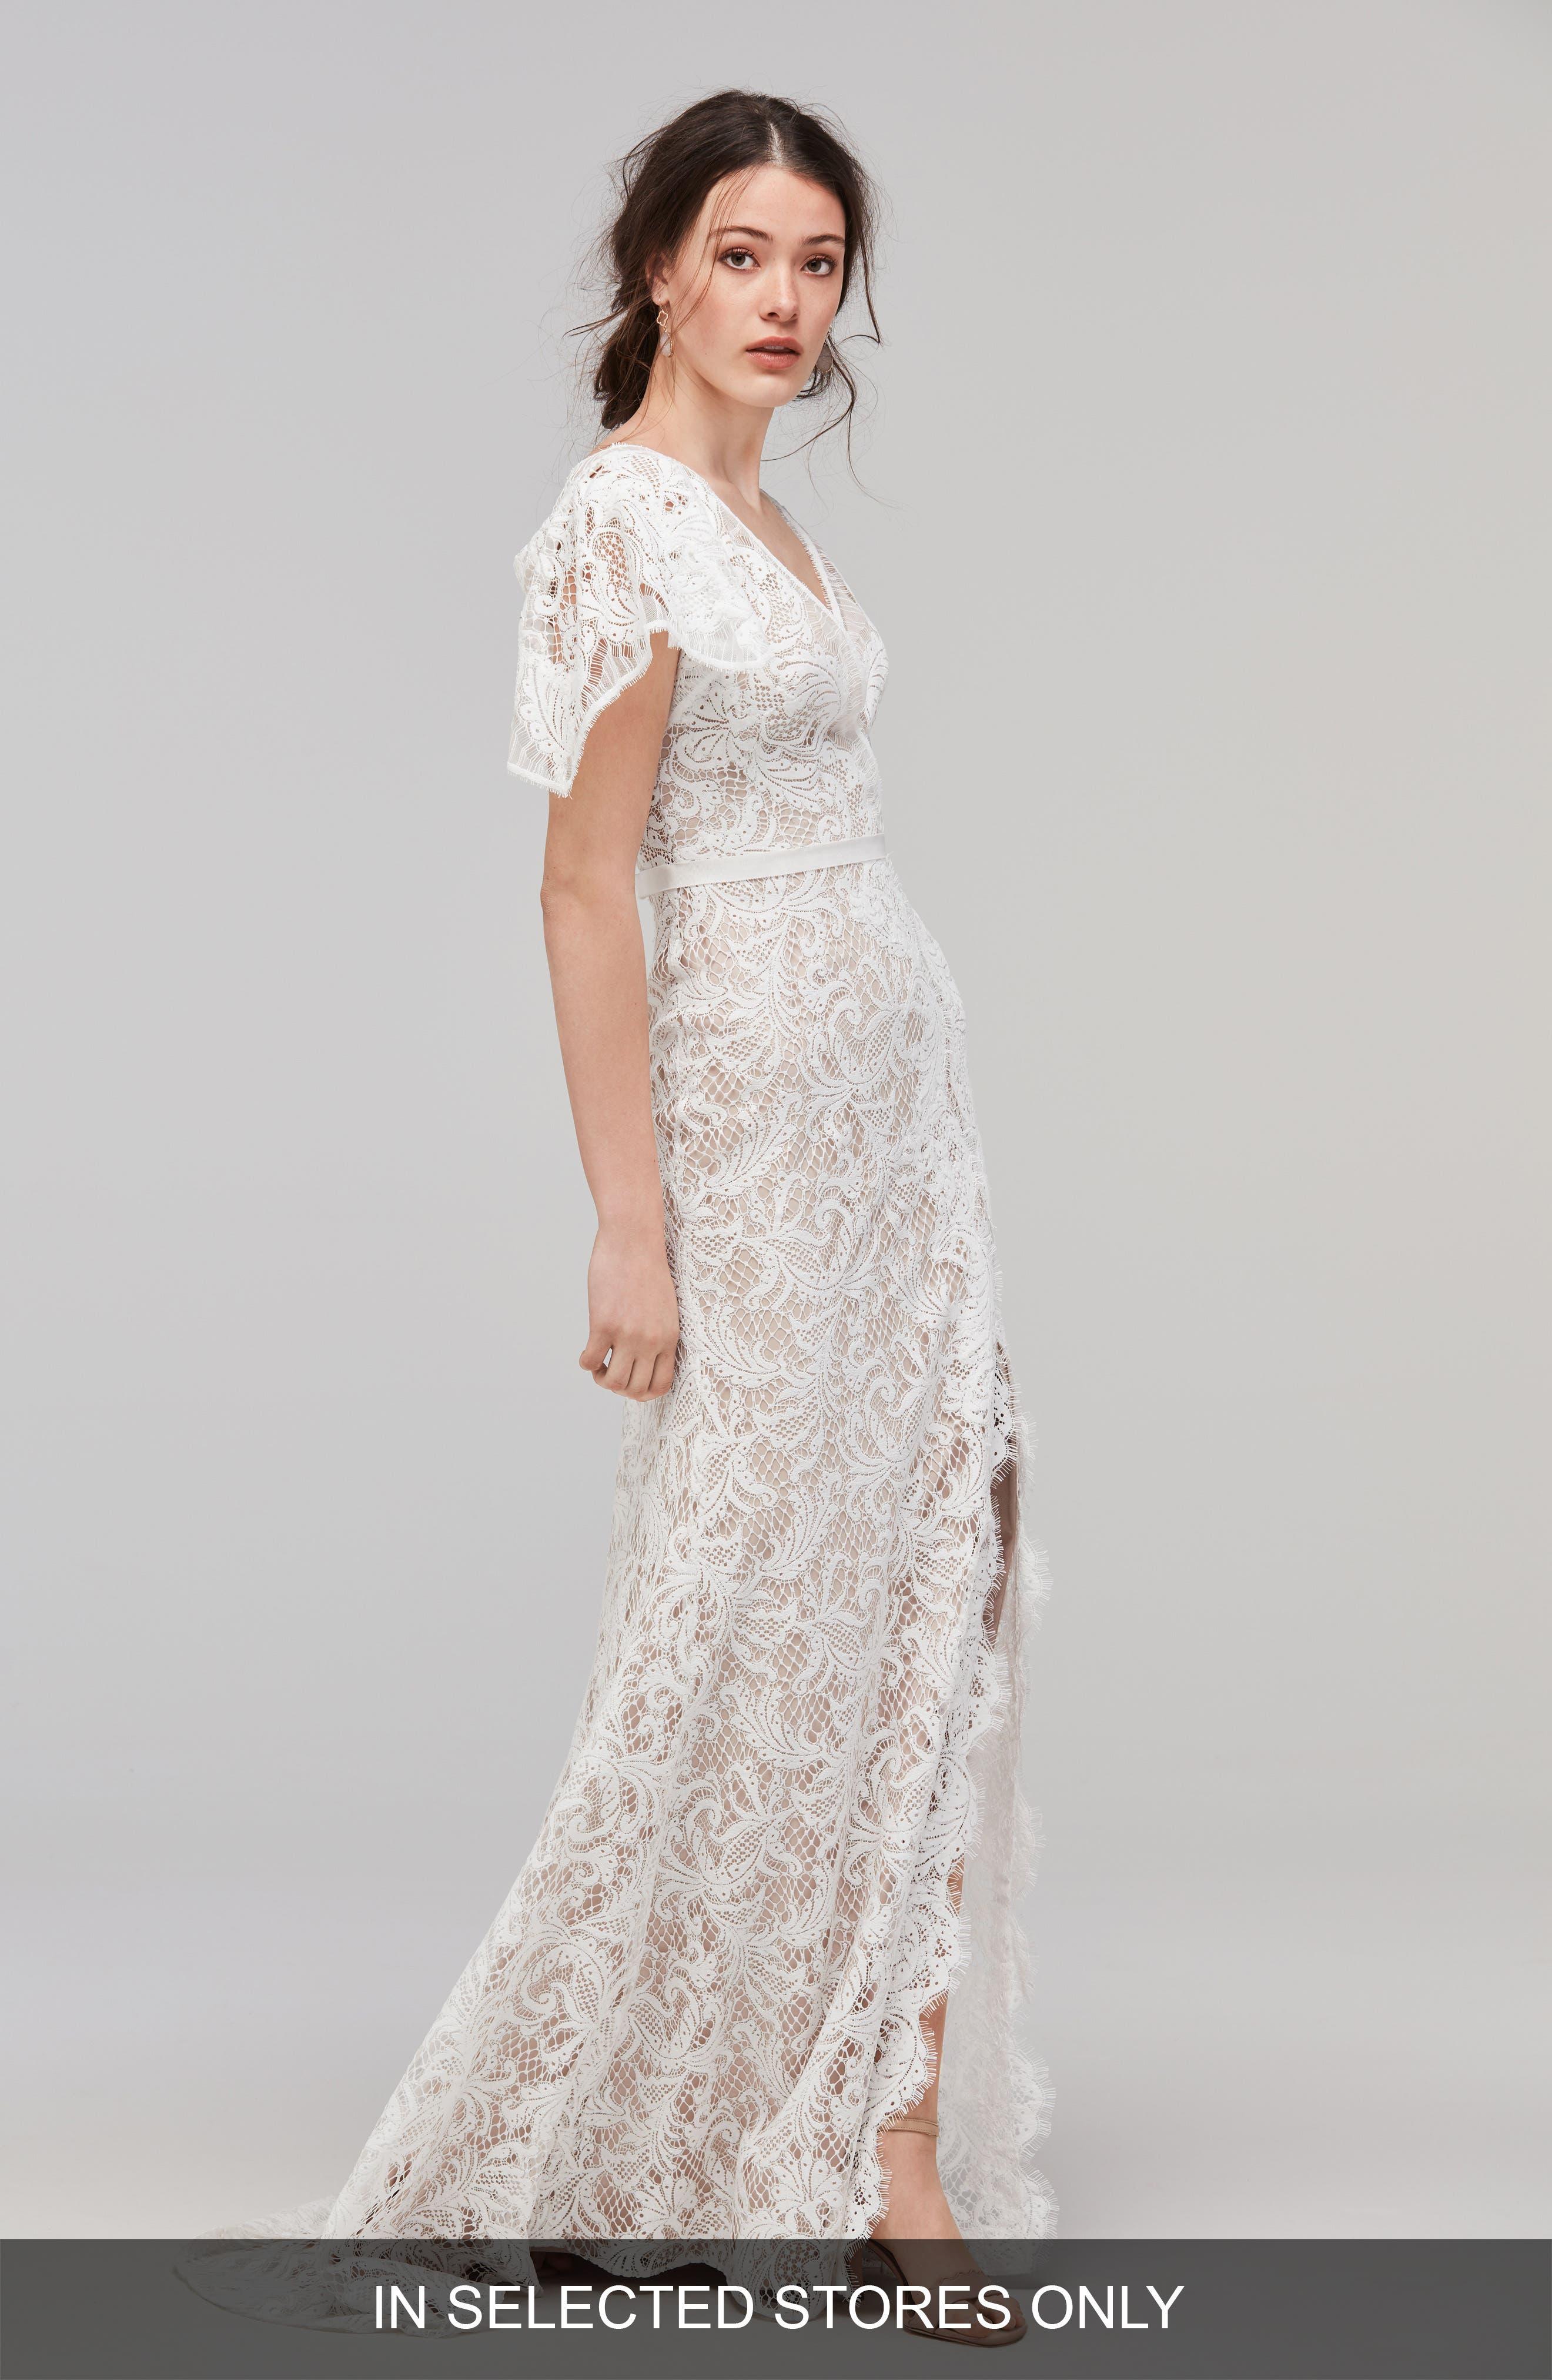 Wedding Ivory Lace Faux Wrap Dress